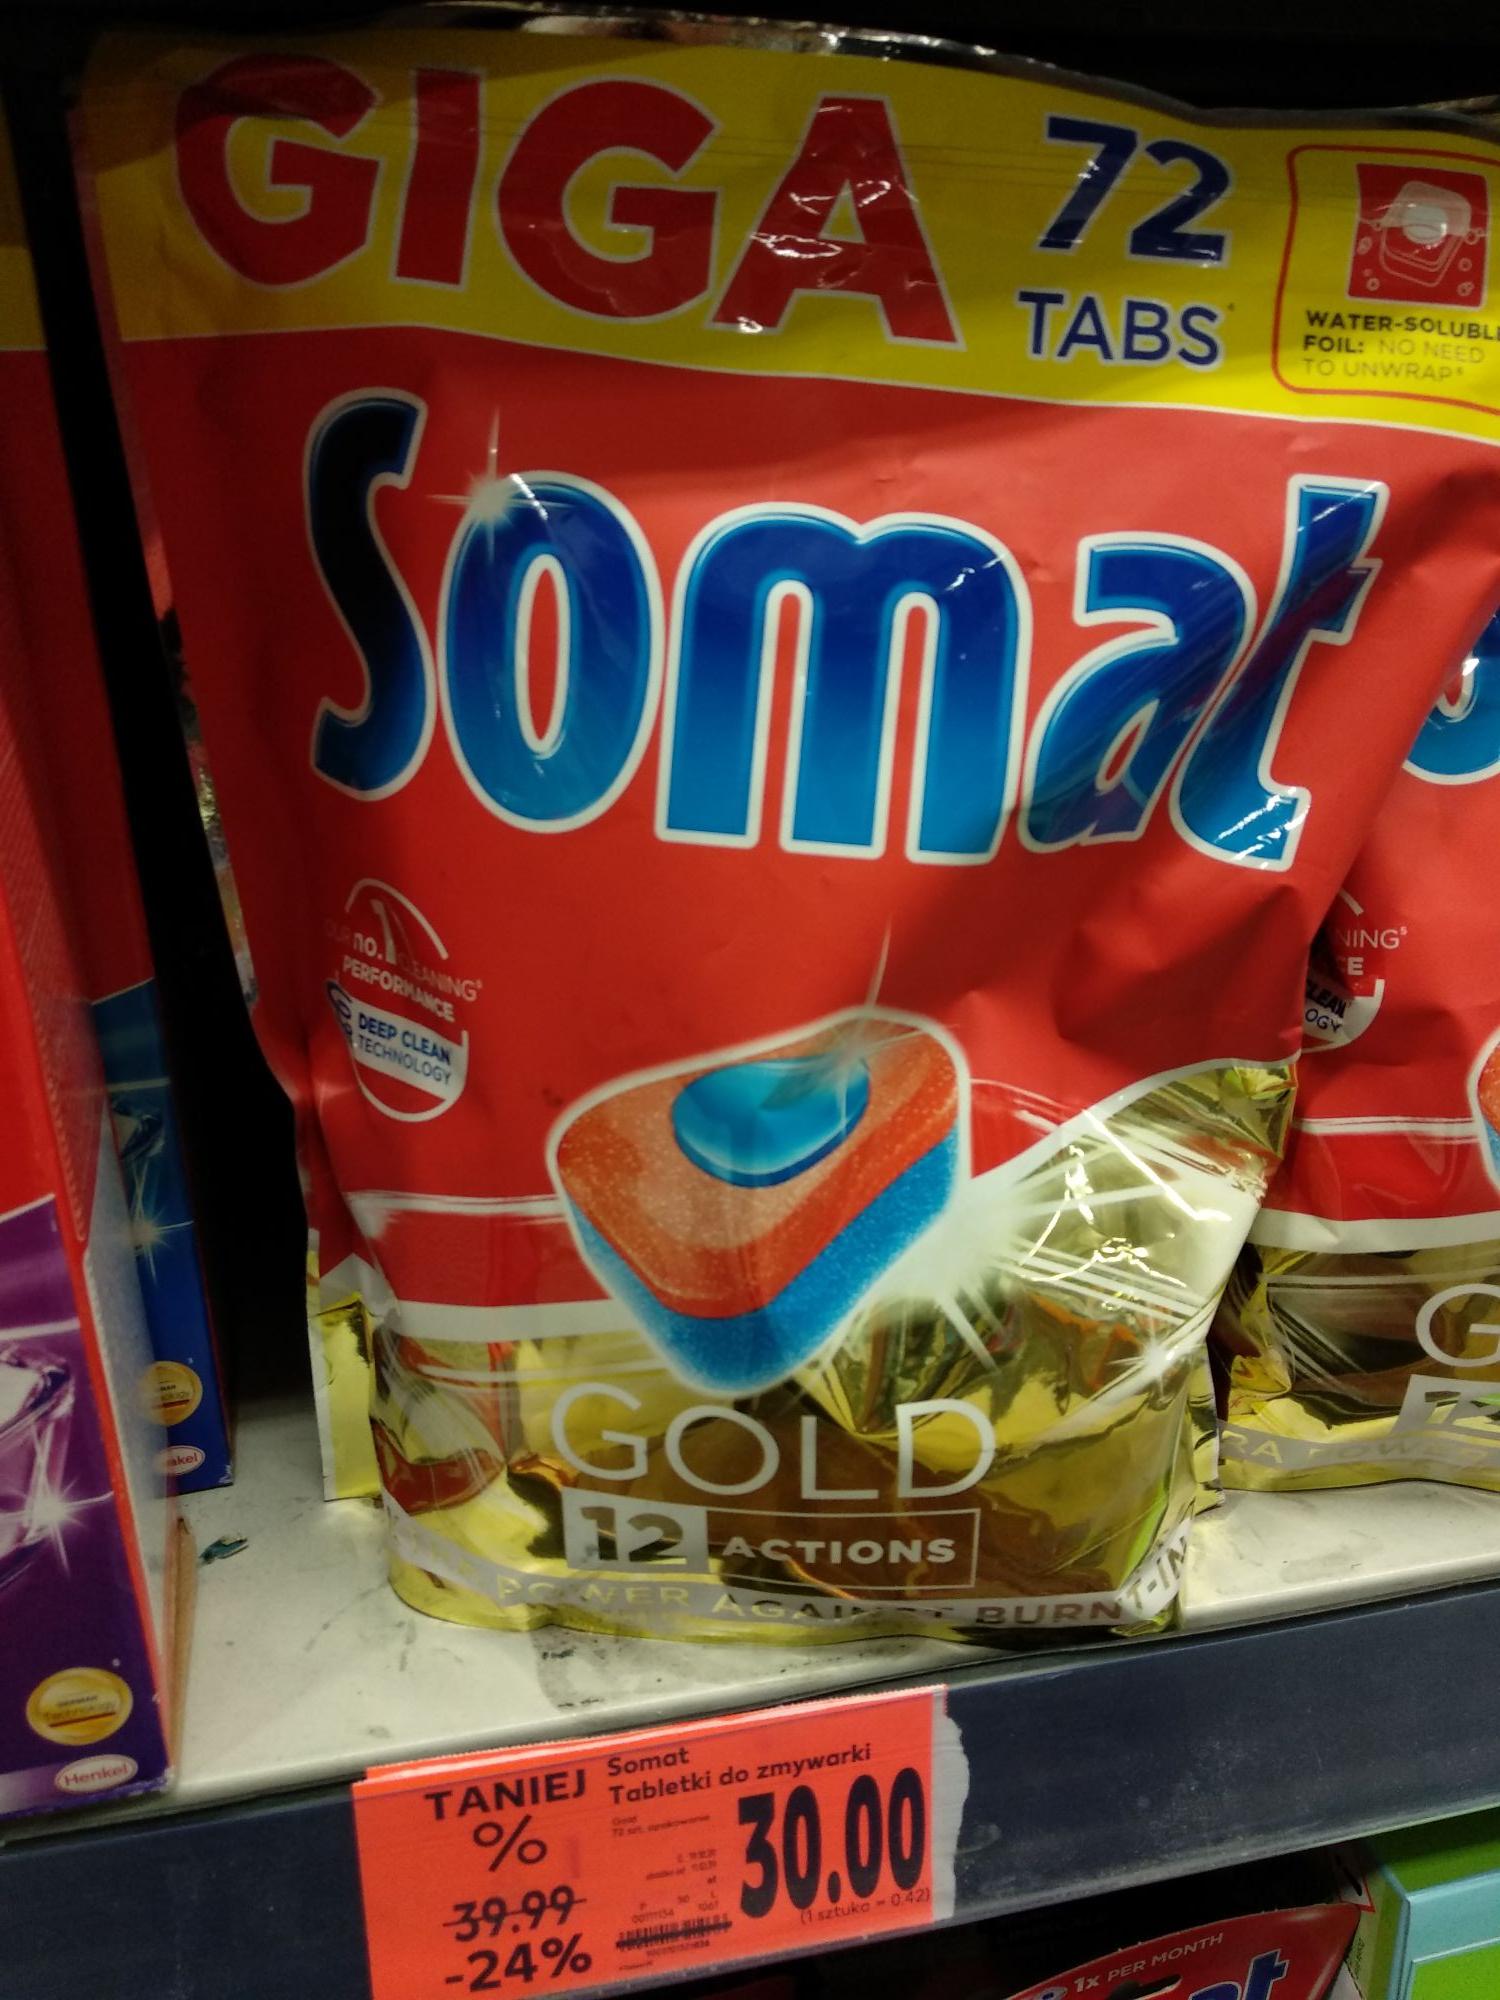 Somat Gold 72 tabs. 0,42 zł za tabletkę